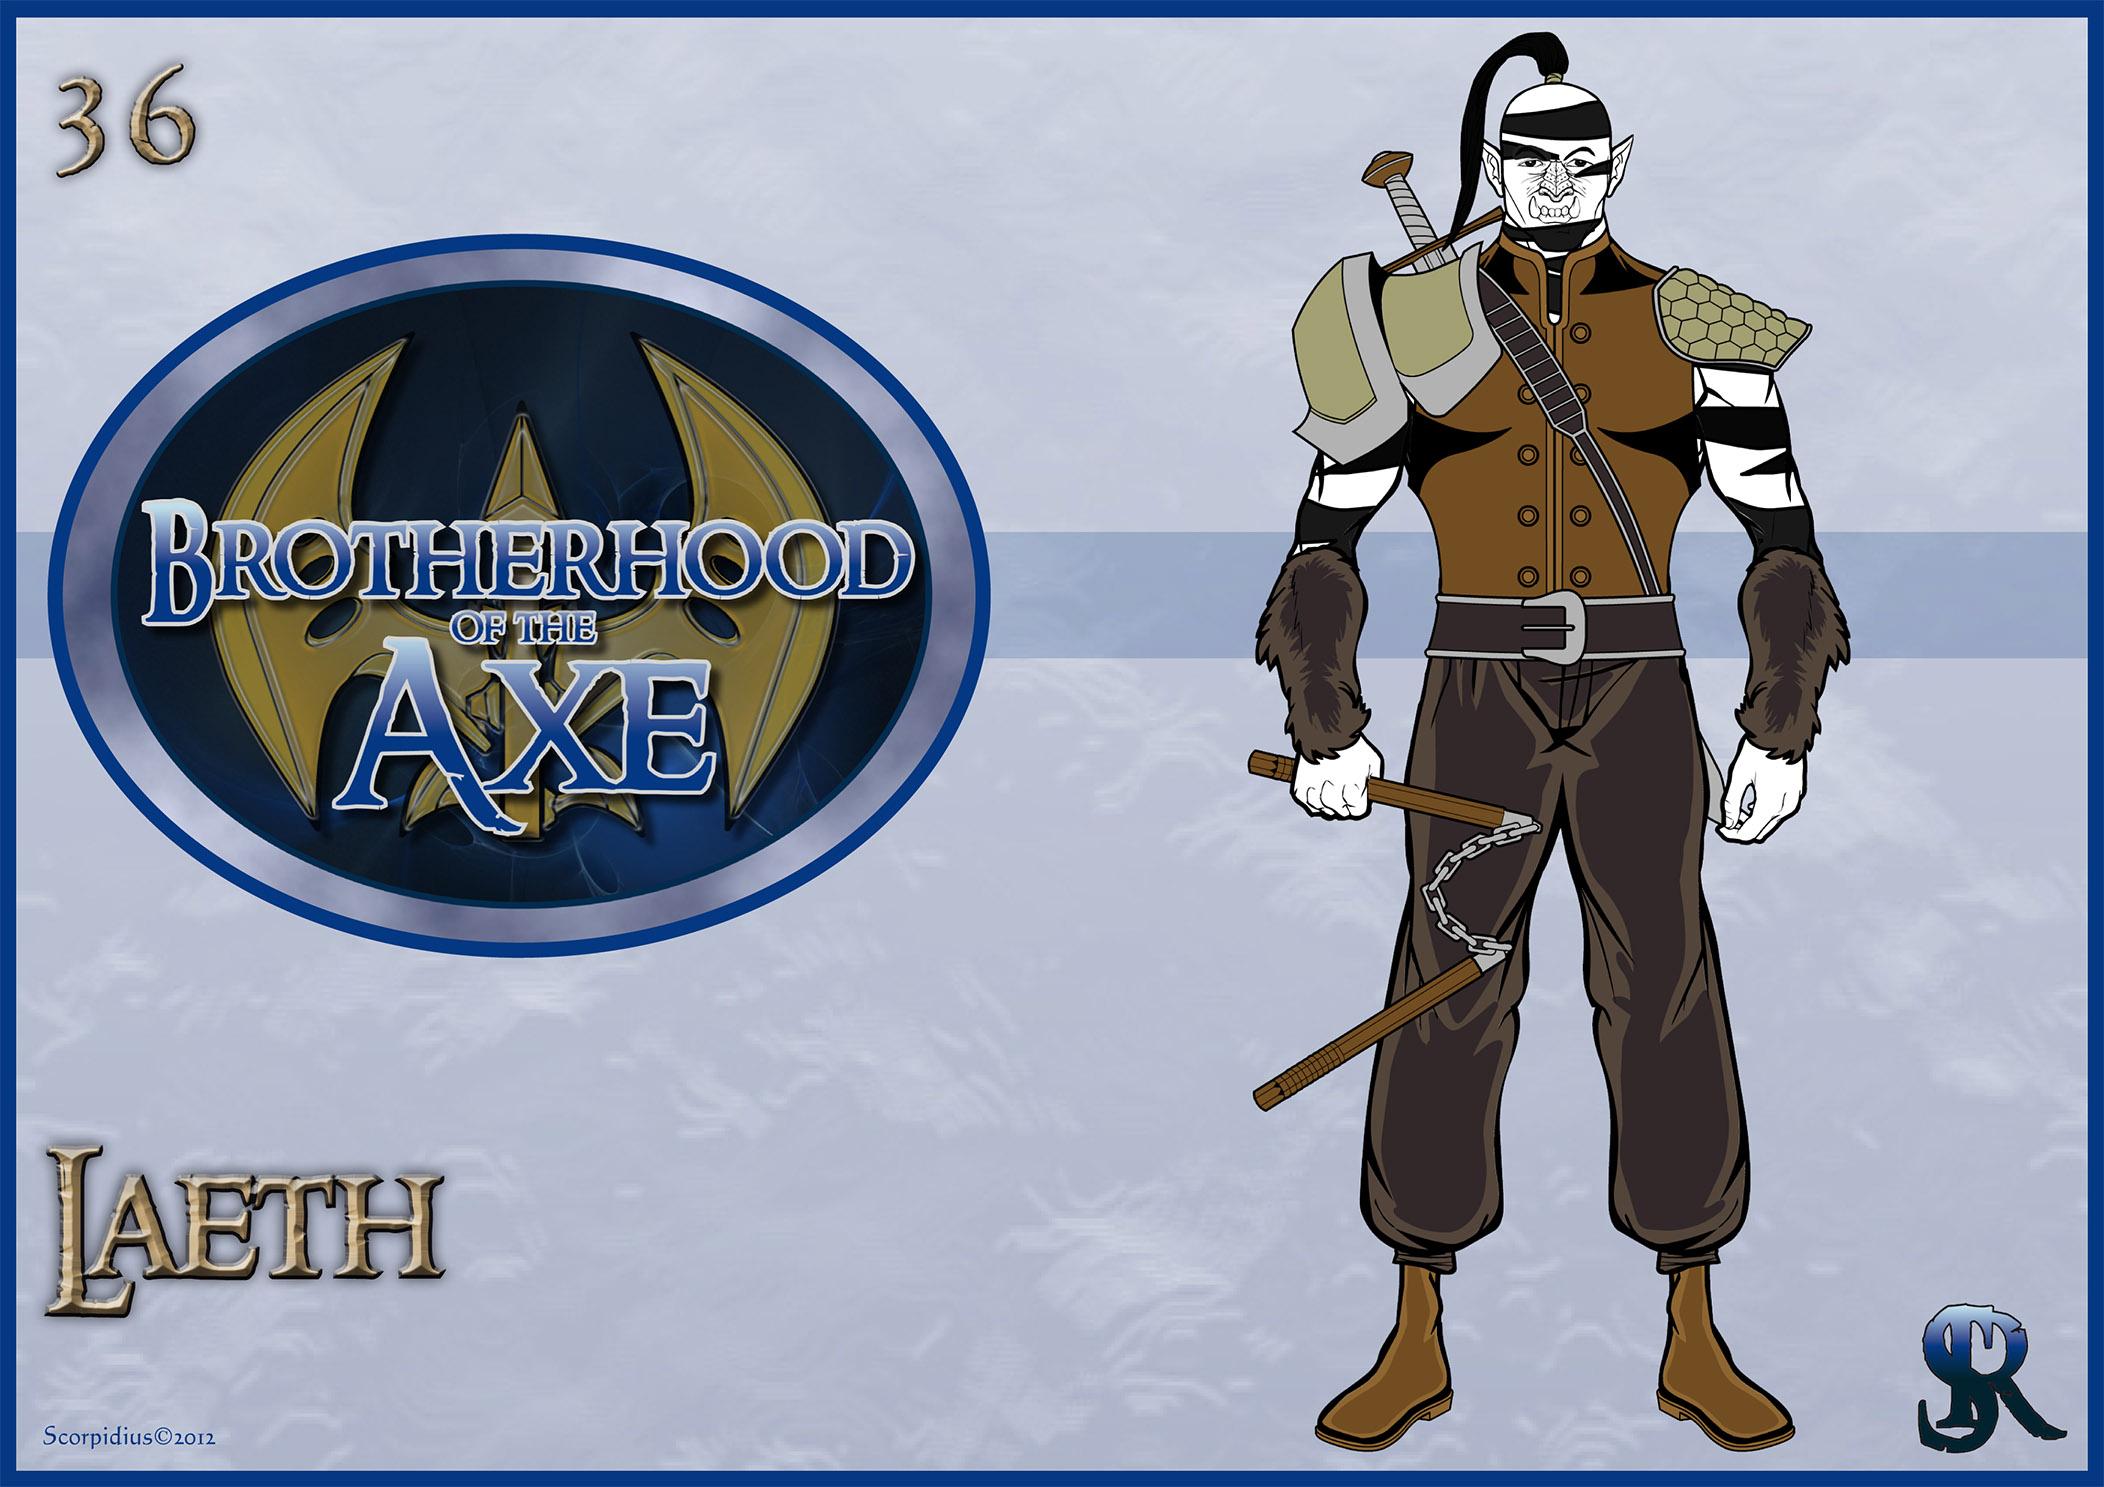 http://www.heromachine.com/wp-content/legacy/forum-image-uploads/scorpidius/2012/03/036-Laeth-1.jpg